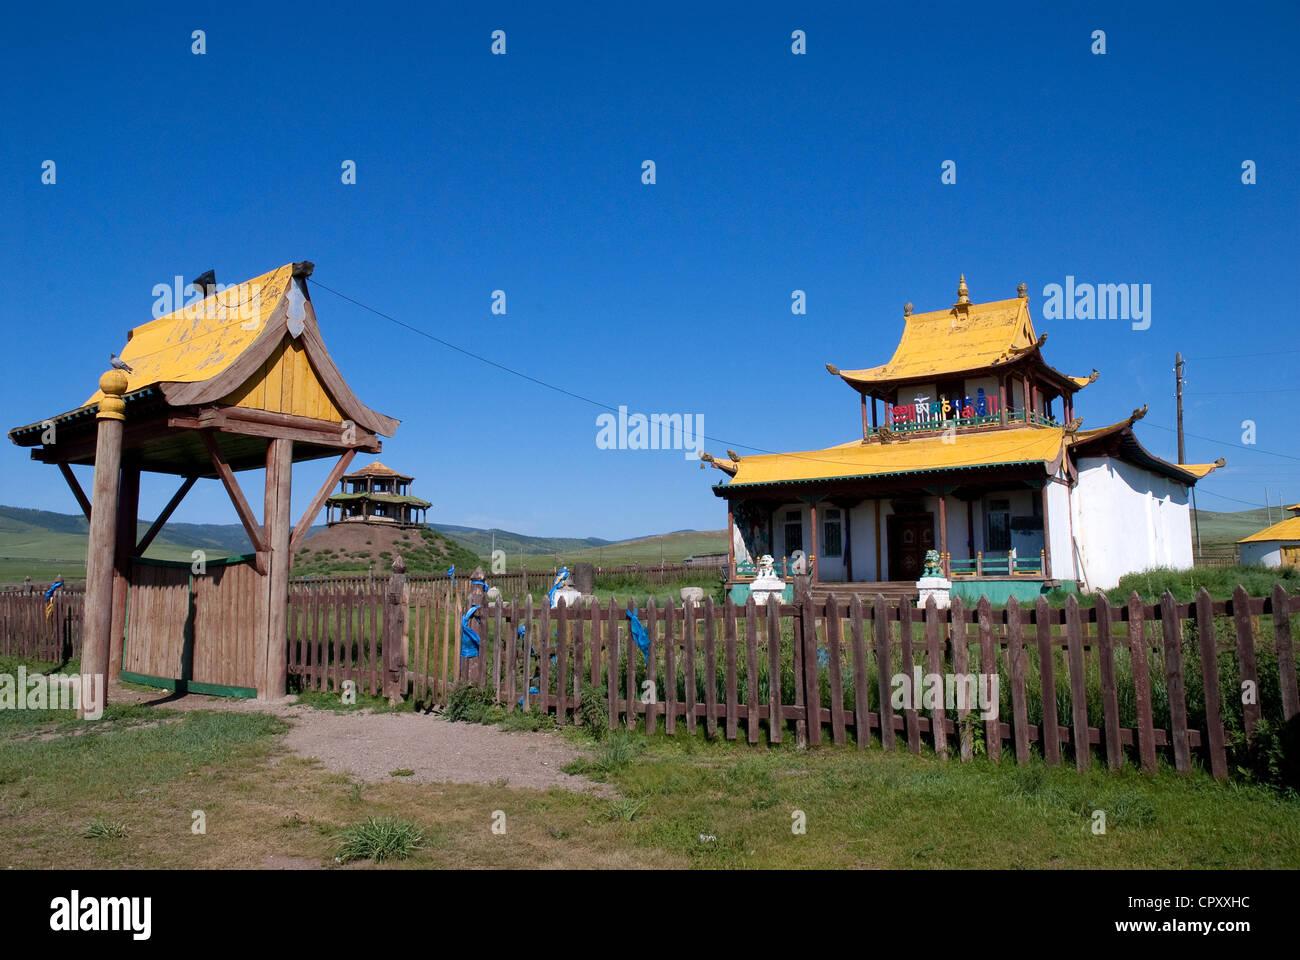 Mongolia, Ovorkhangai Region, Buddhist monastery - Stock Image